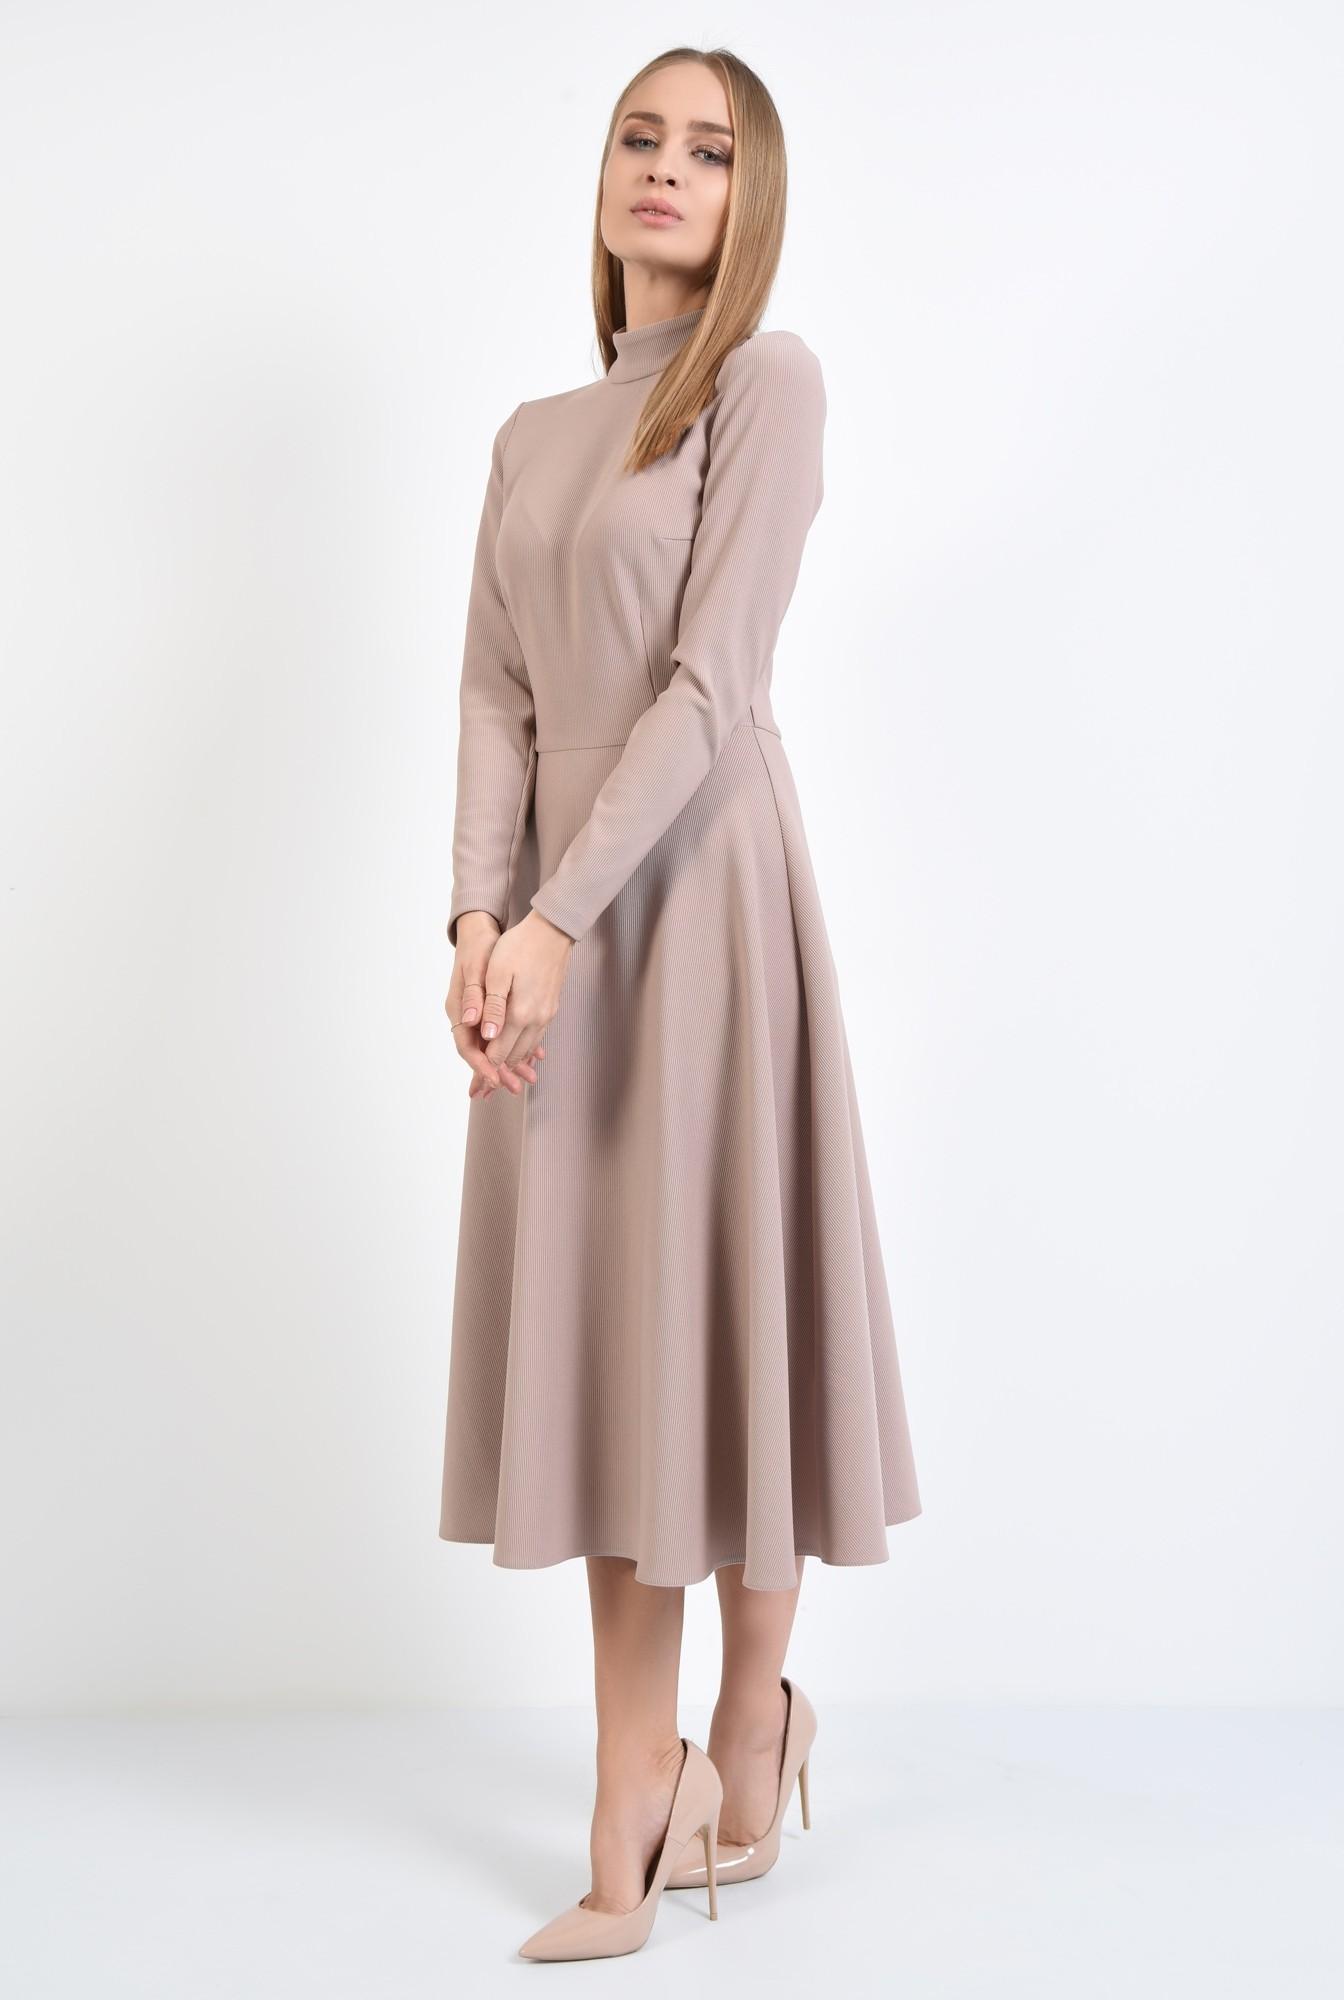 3 - rochie evazata, cu guler inalt, nasturi perla la spate, roz